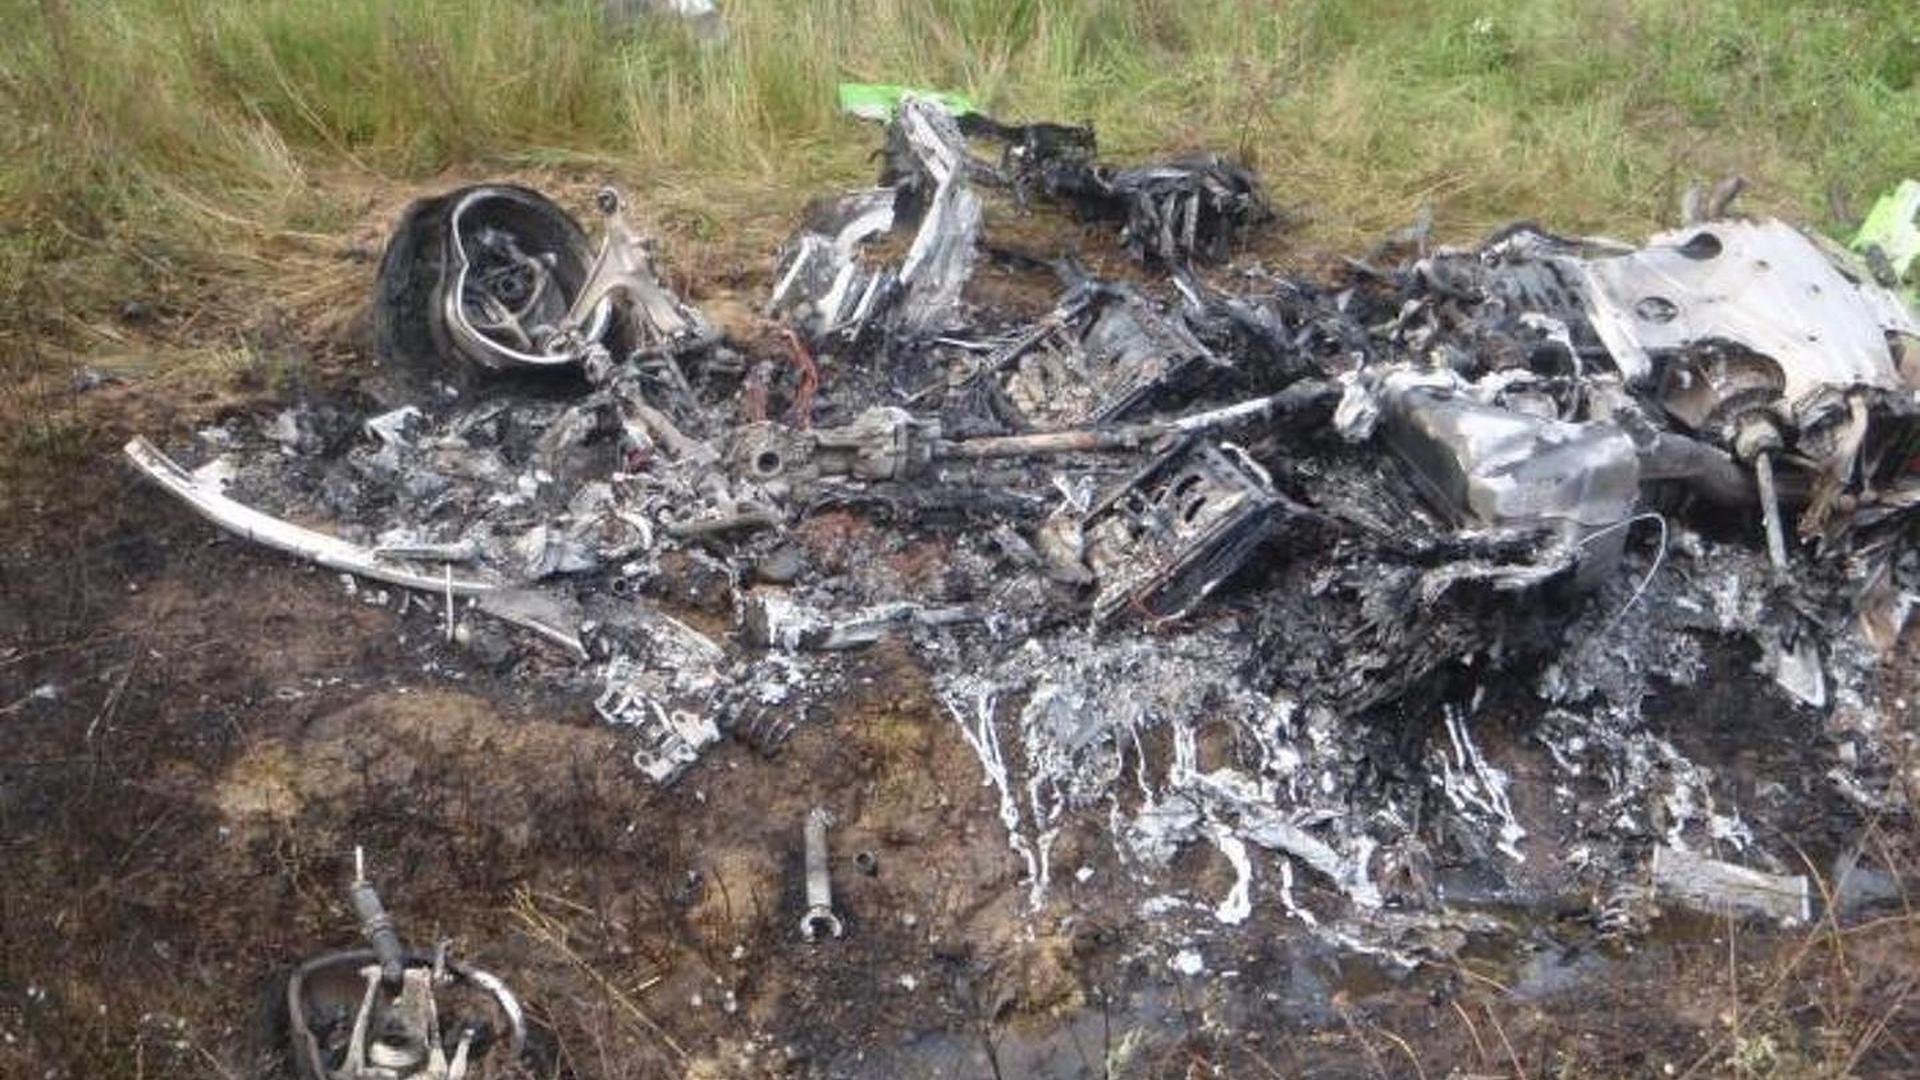 Lamborghini Huracan burns beyond recognition after crash in Hungary